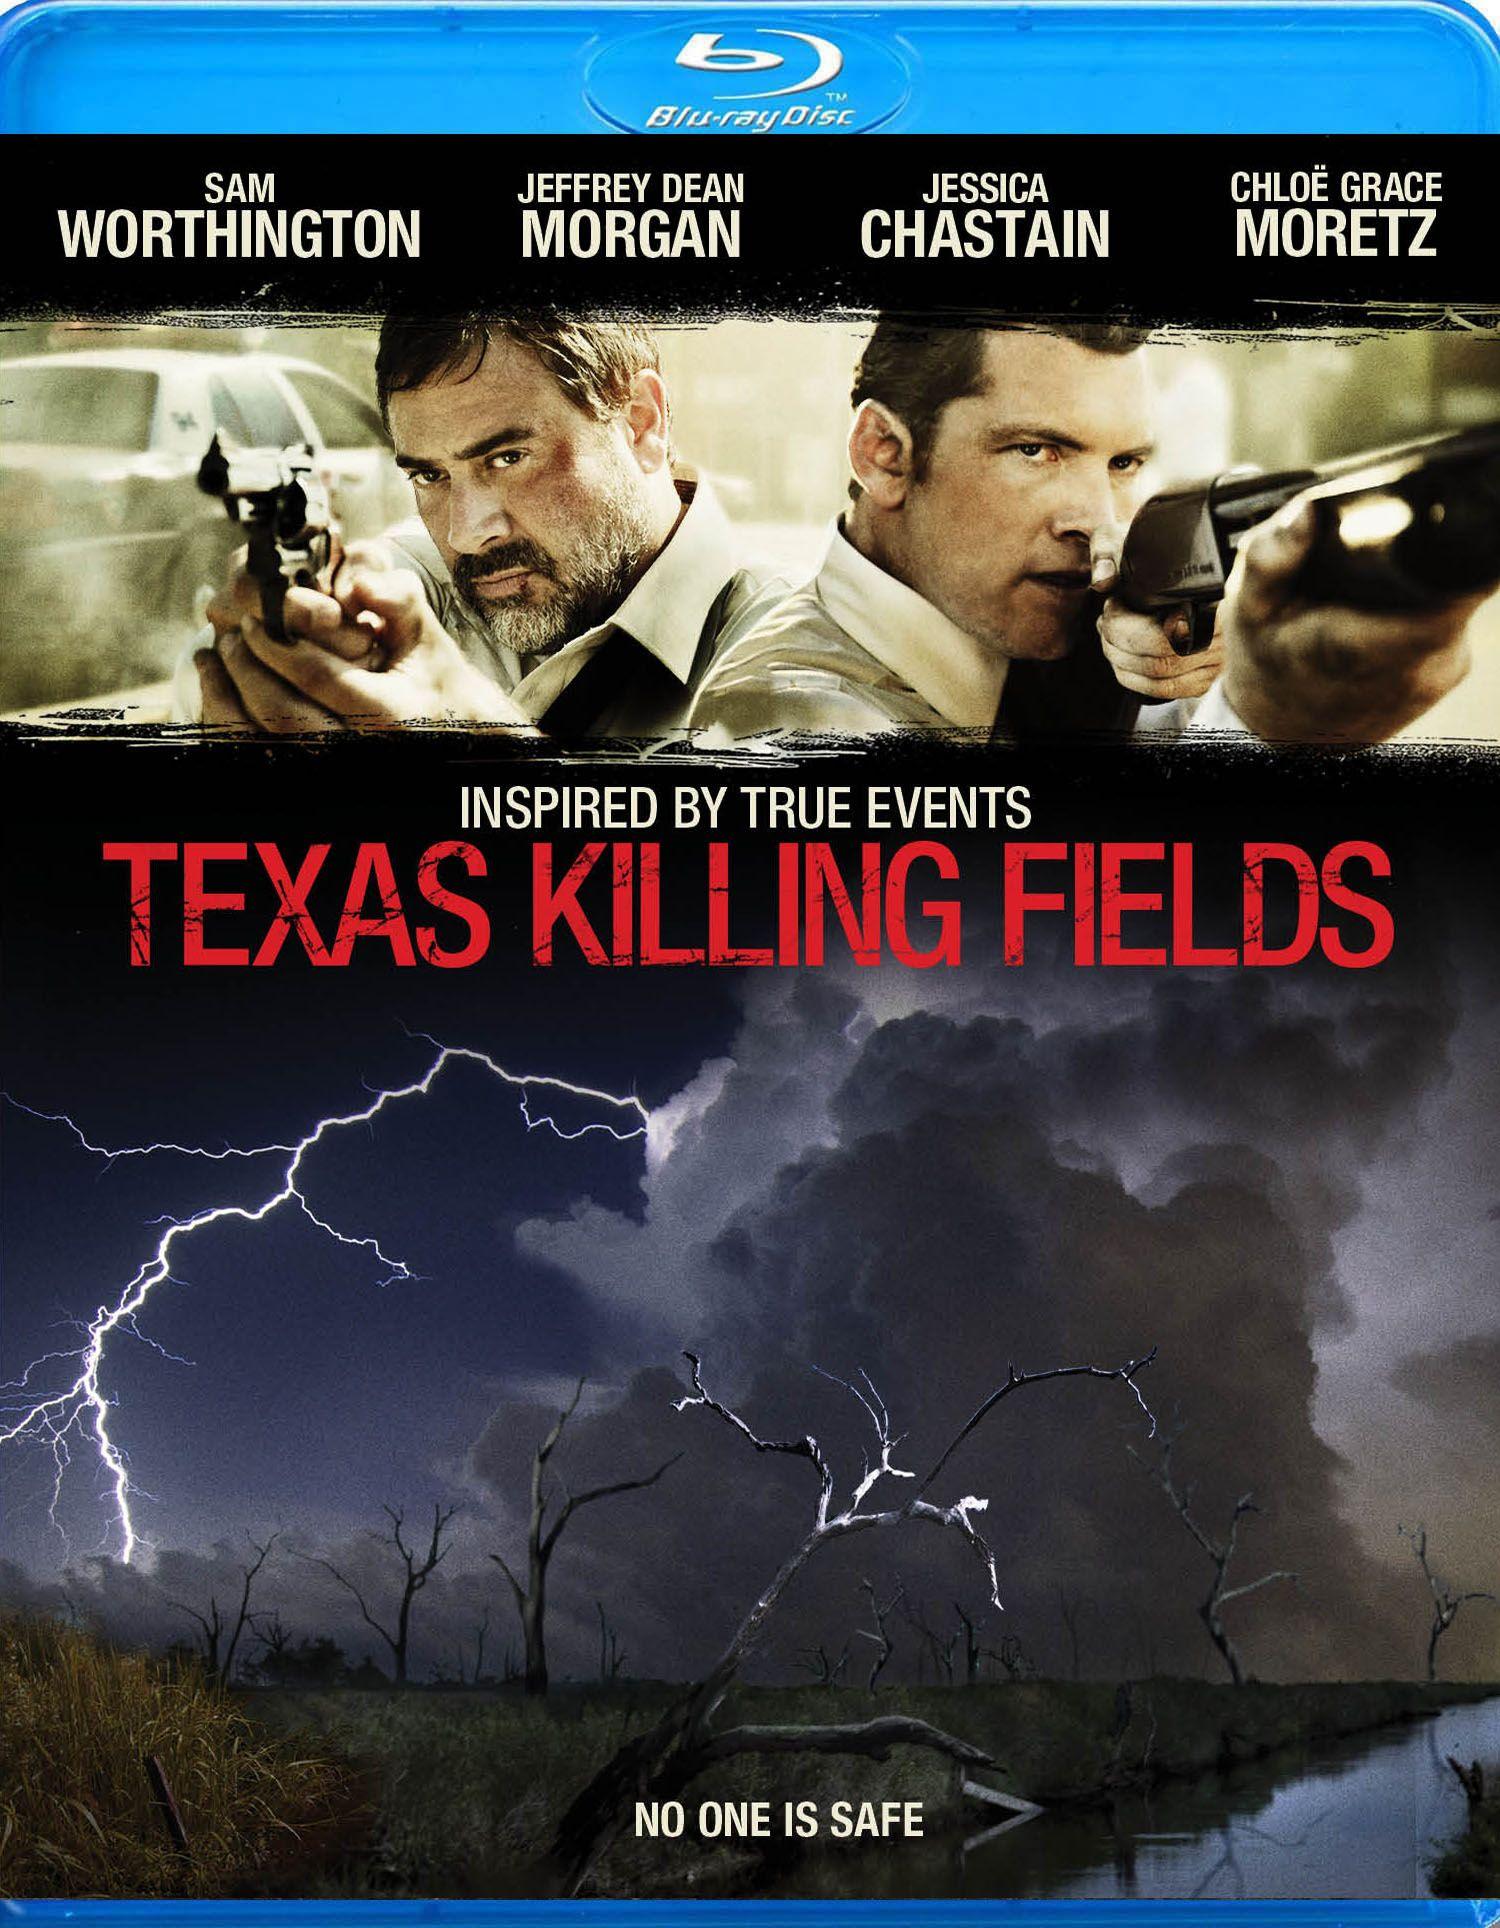 Texas killing